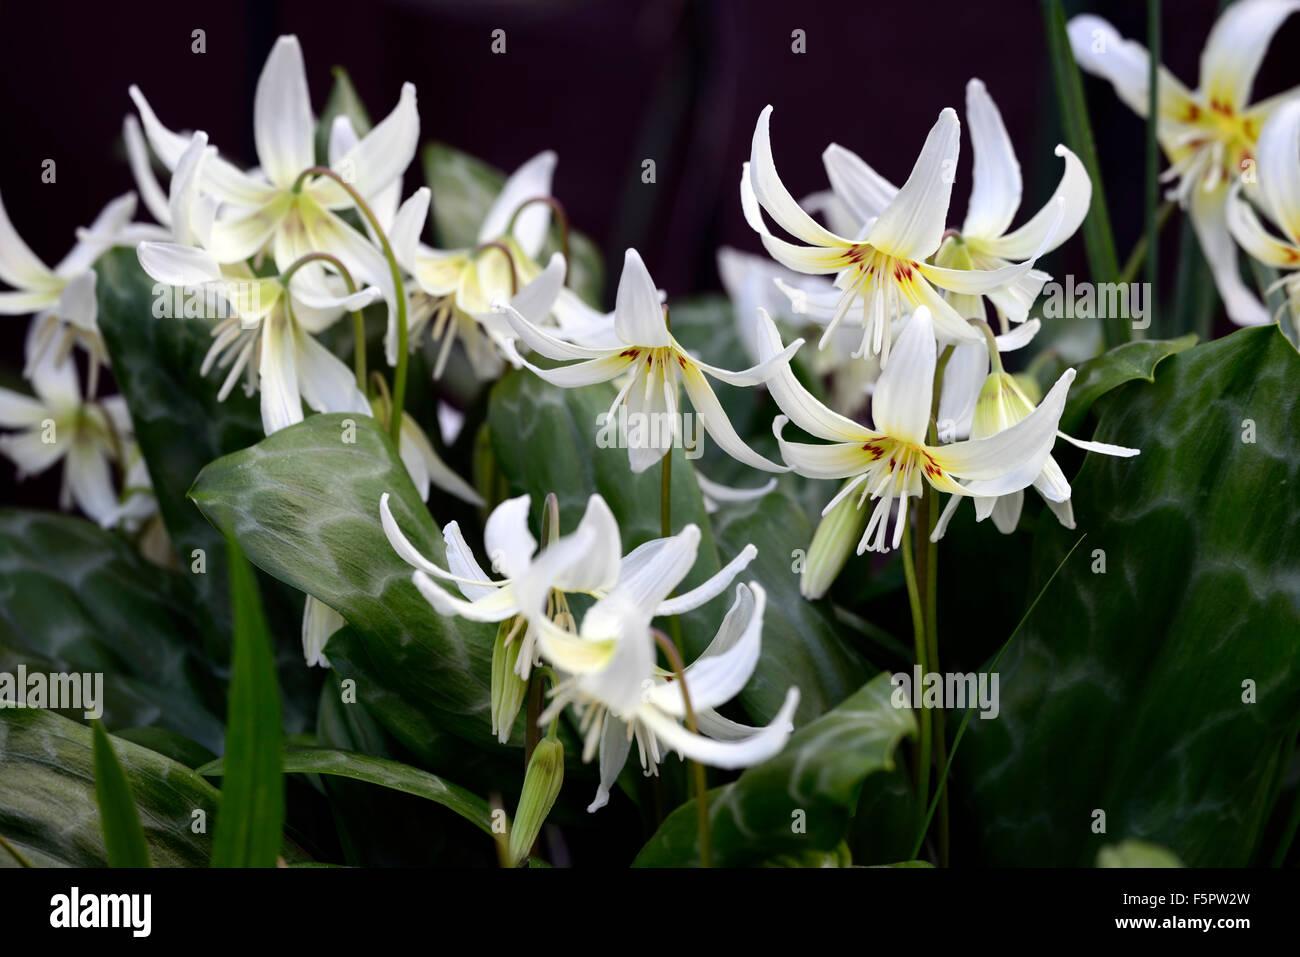 Erythronium Californicum weiße Pracht Fawn Lily Dogstooth violett ...